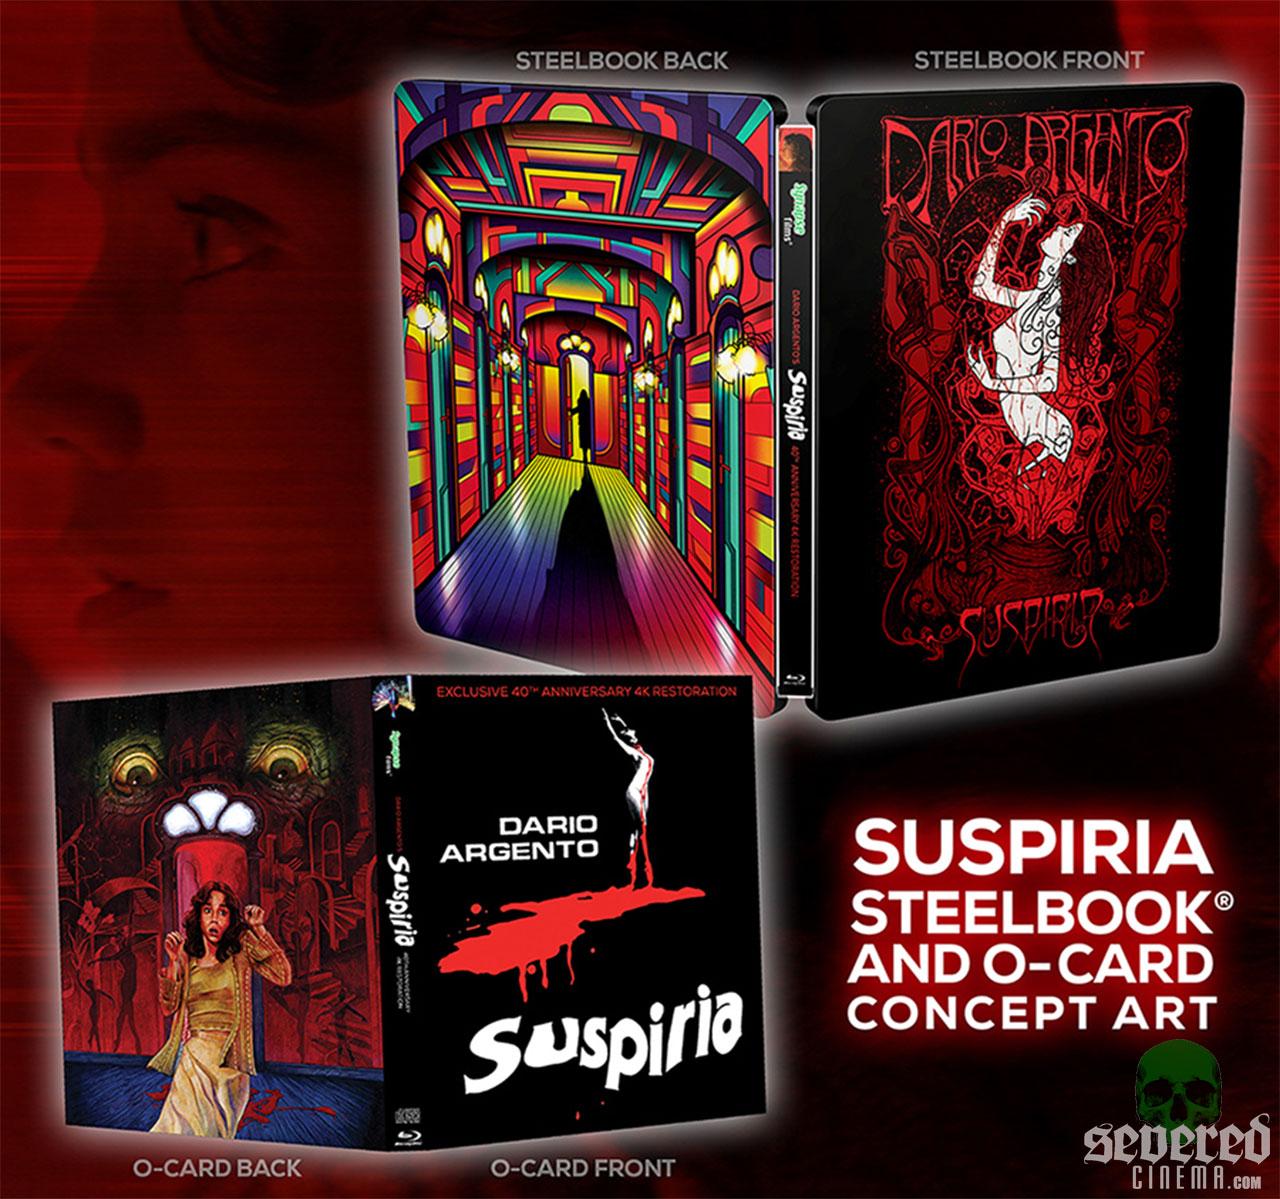 Severed Cinema News: Suspiria's 40th Anniversary via Synapse!